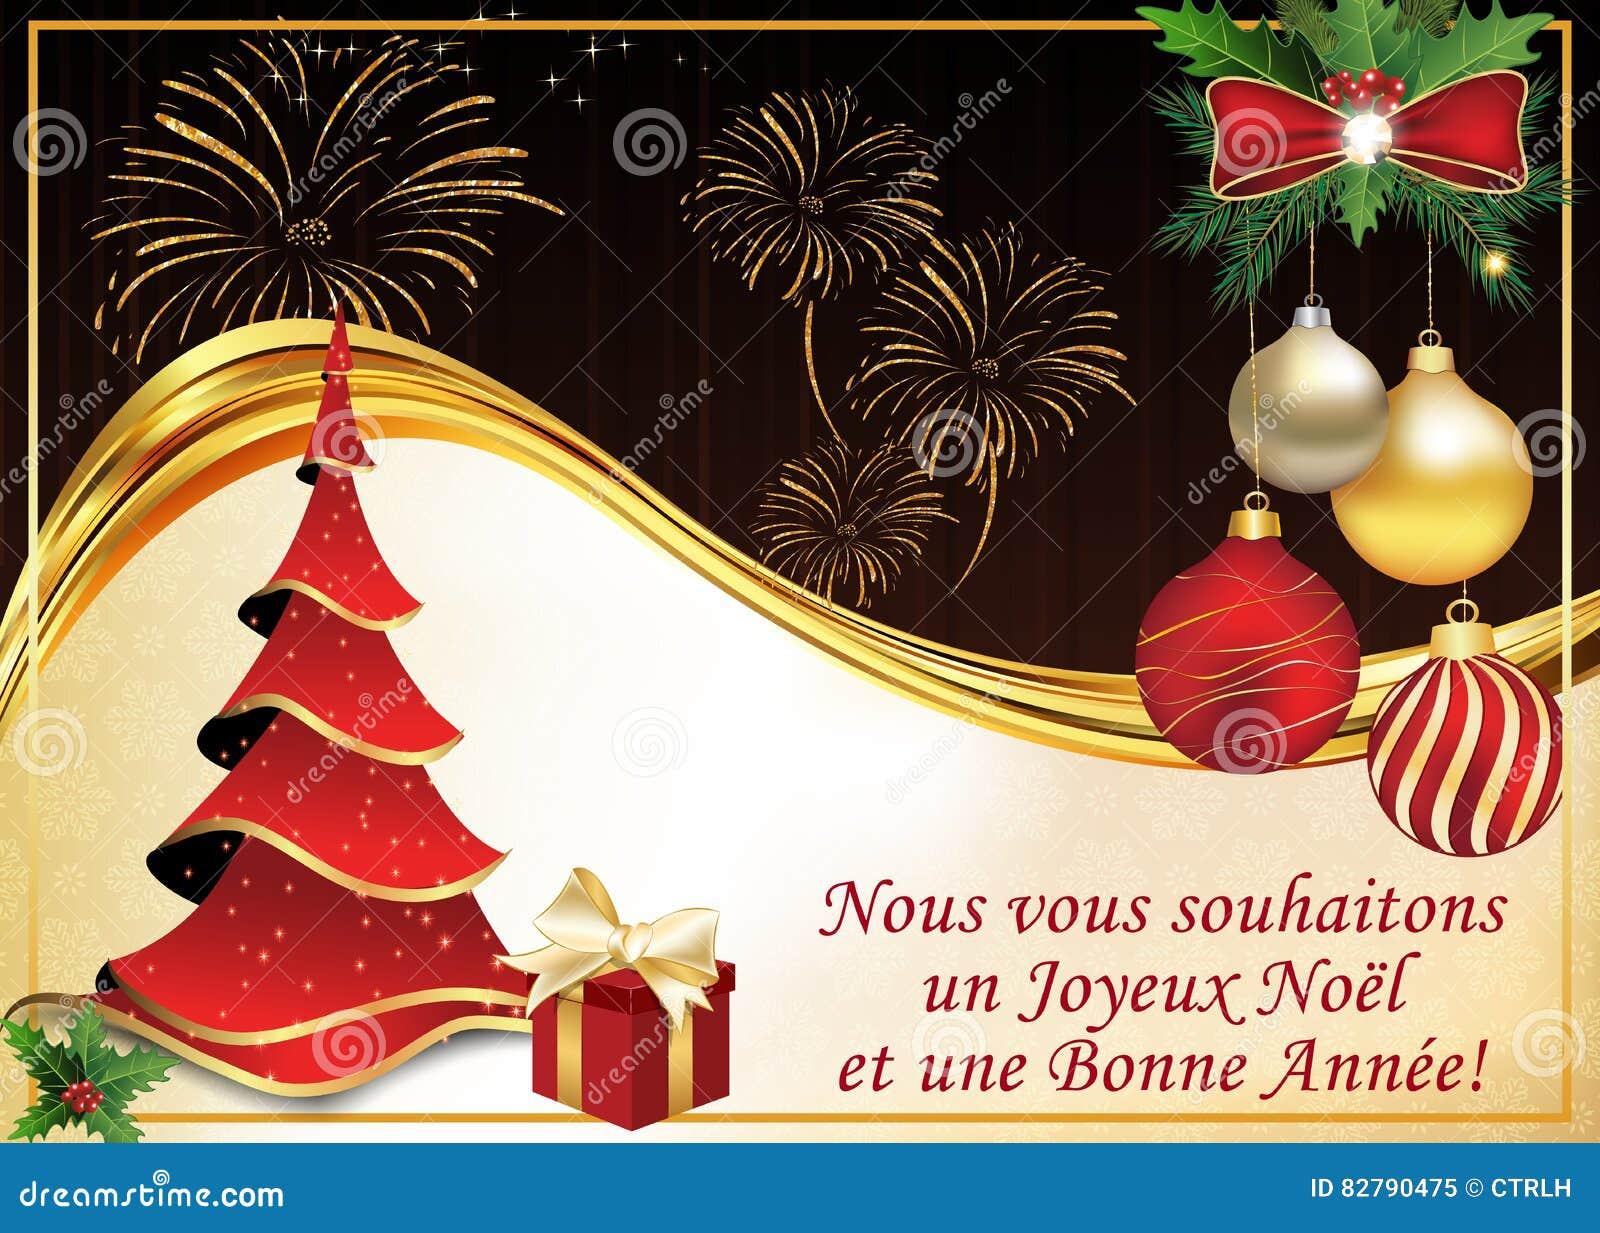 Auguri Di Buon Natale Francese.Cartolina D Auguri Francese Vi Auguriamo Il Buon Natale Ed